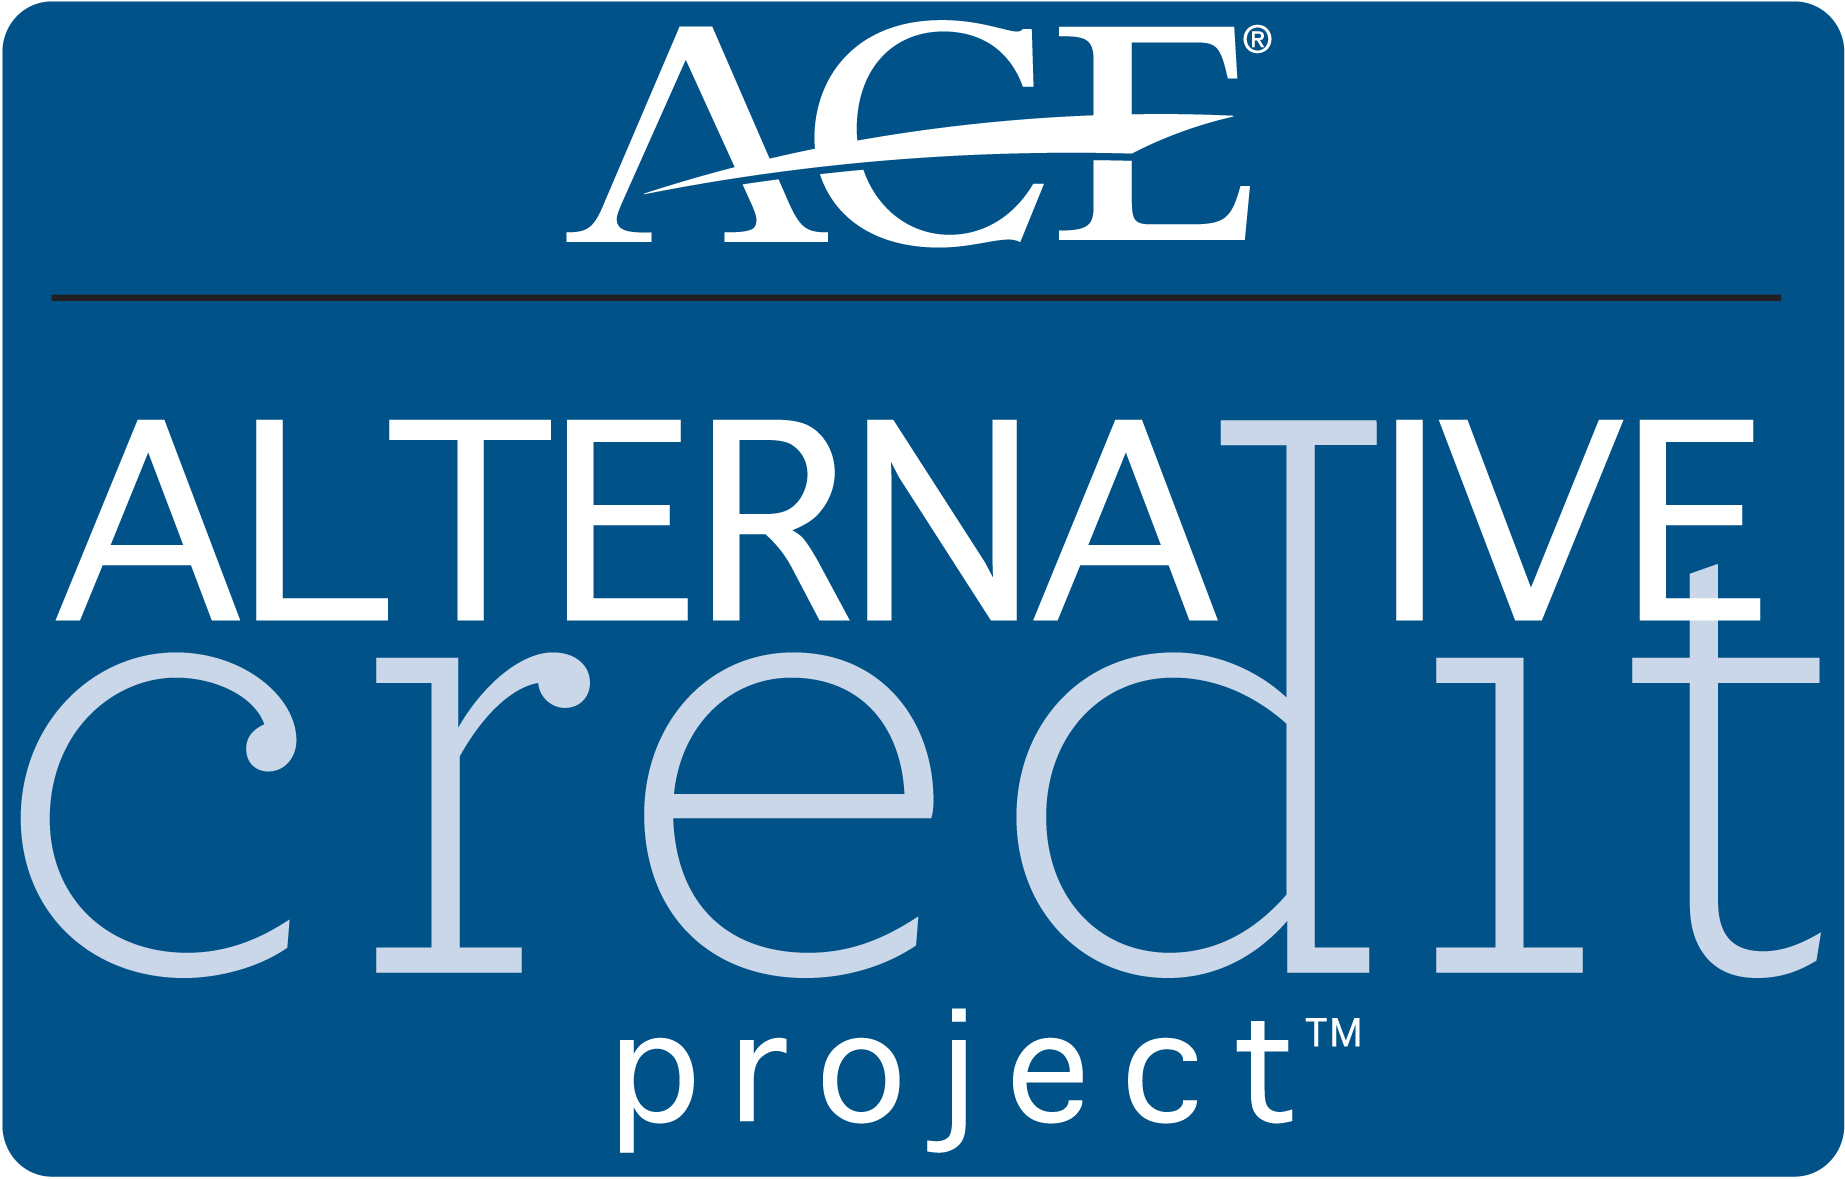 Alternative Credit Project